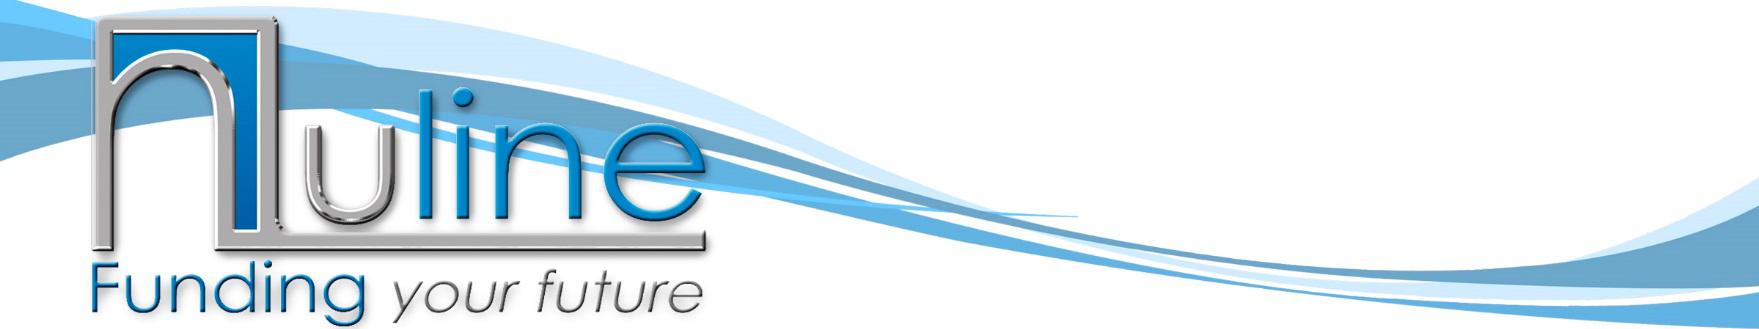 Nuline Funding Inc. logo